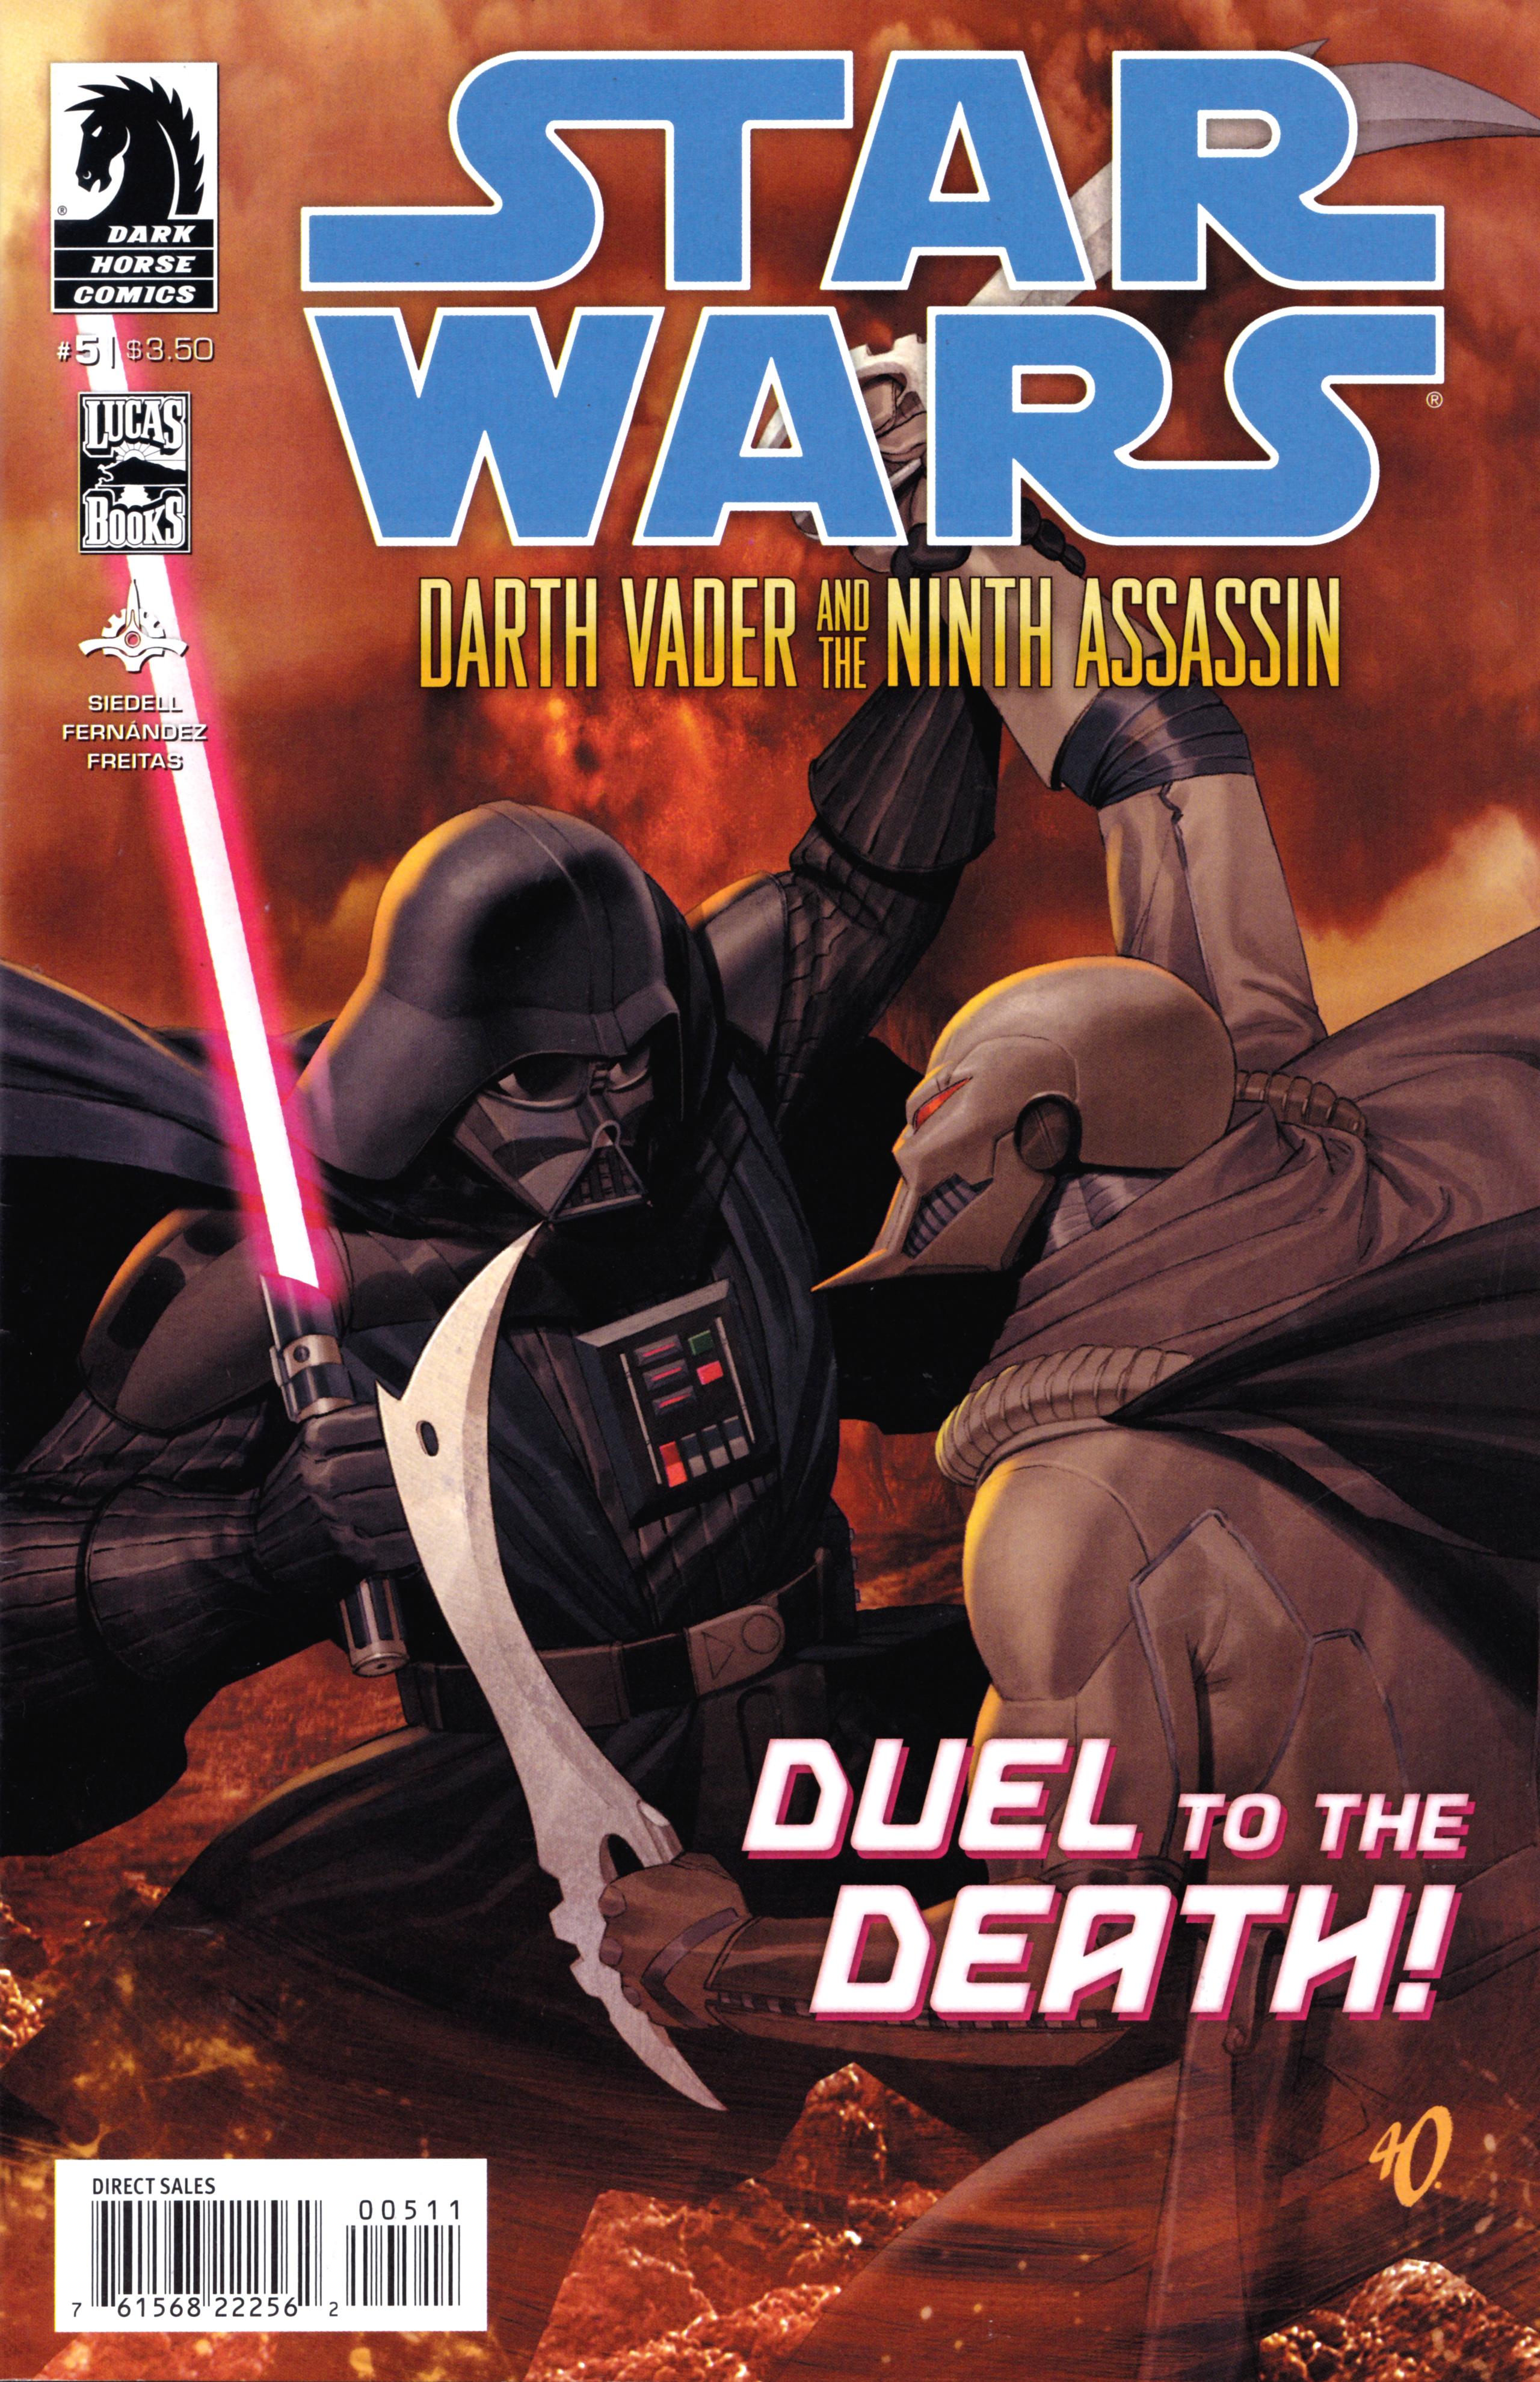 Star Wars: Darth Vader and the Ninth Assassin 5 Page 1